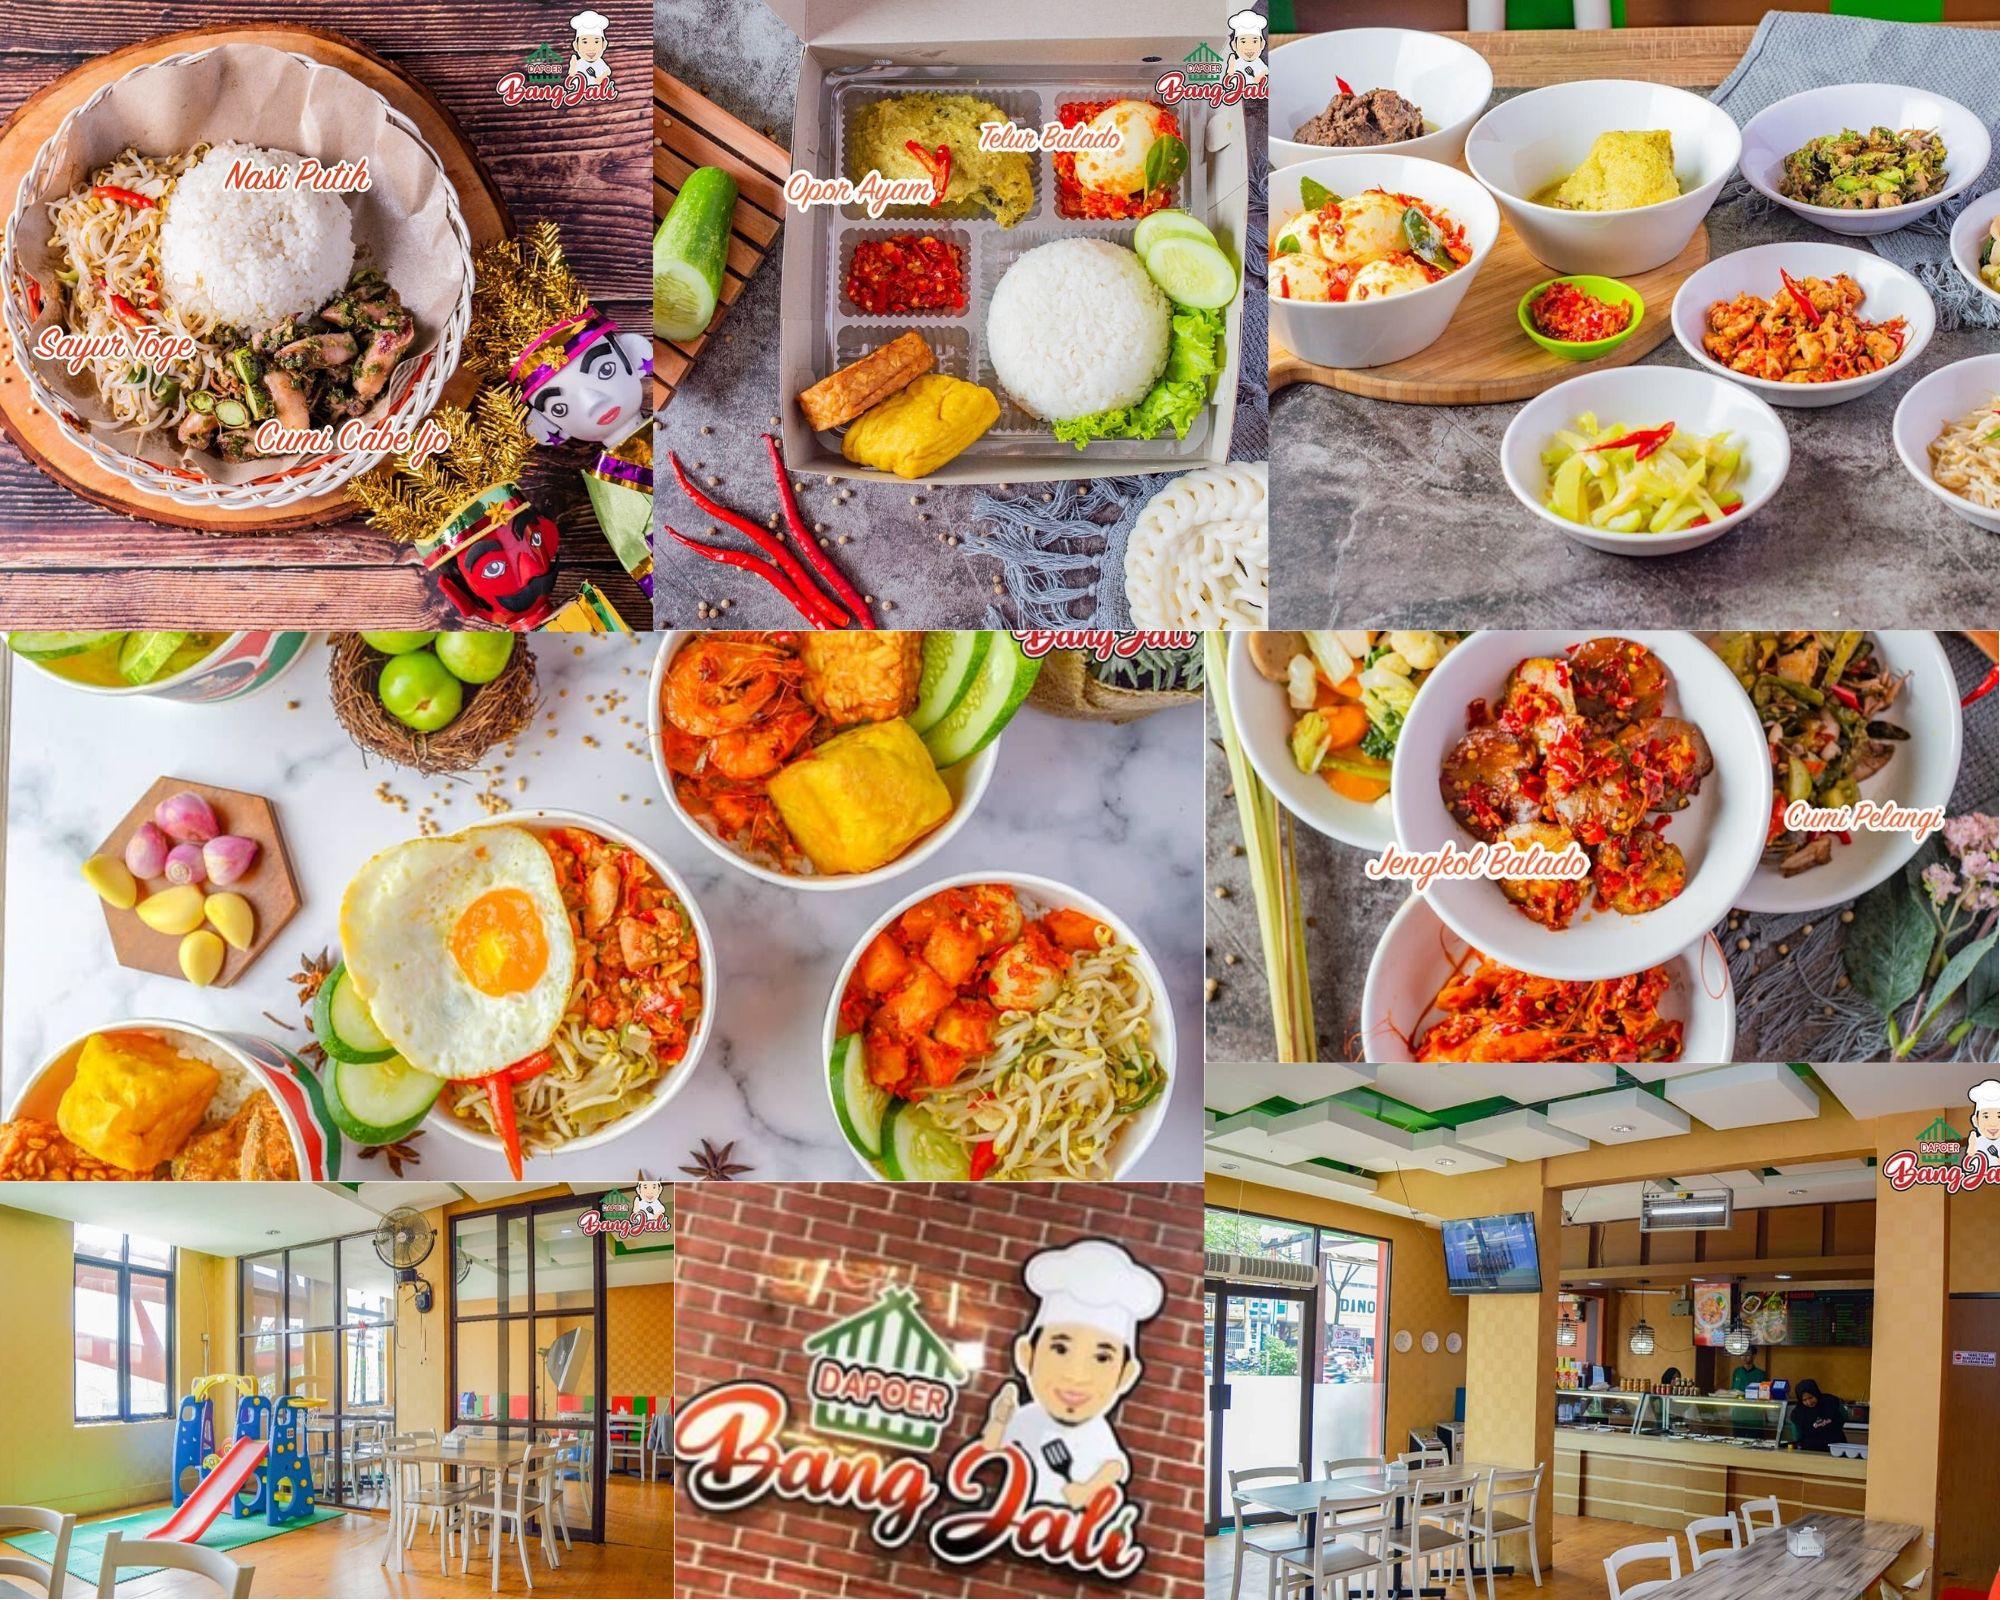 Bisnis kuliner milik 6 artis ini recommended banget buat ...